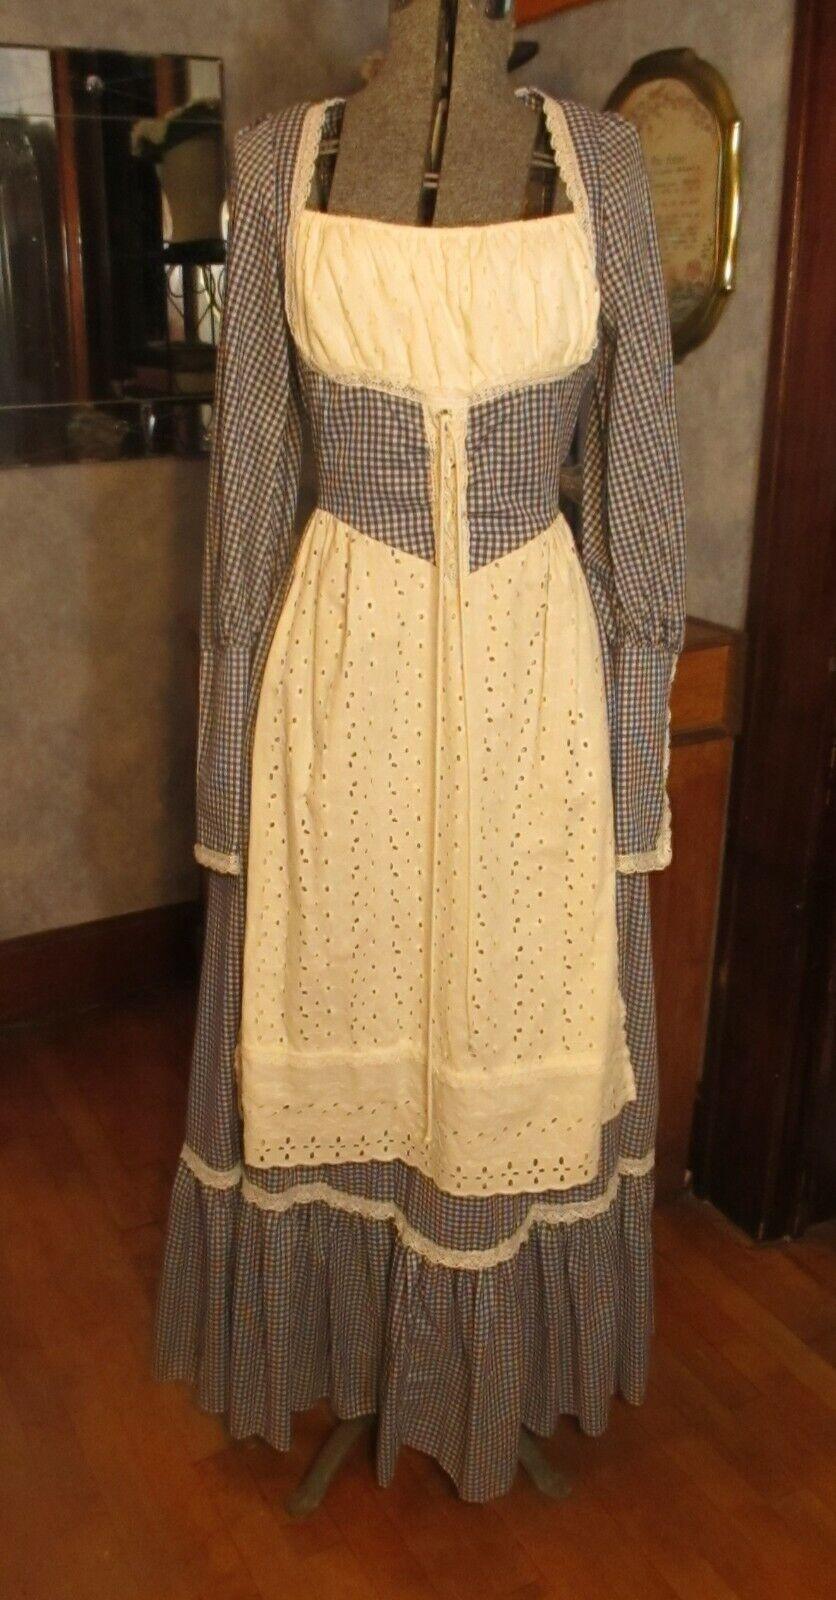 Rare Vintage Jessica Gunne Sax Boho Prairie Maxi White & Blue Check Dress Sz 13